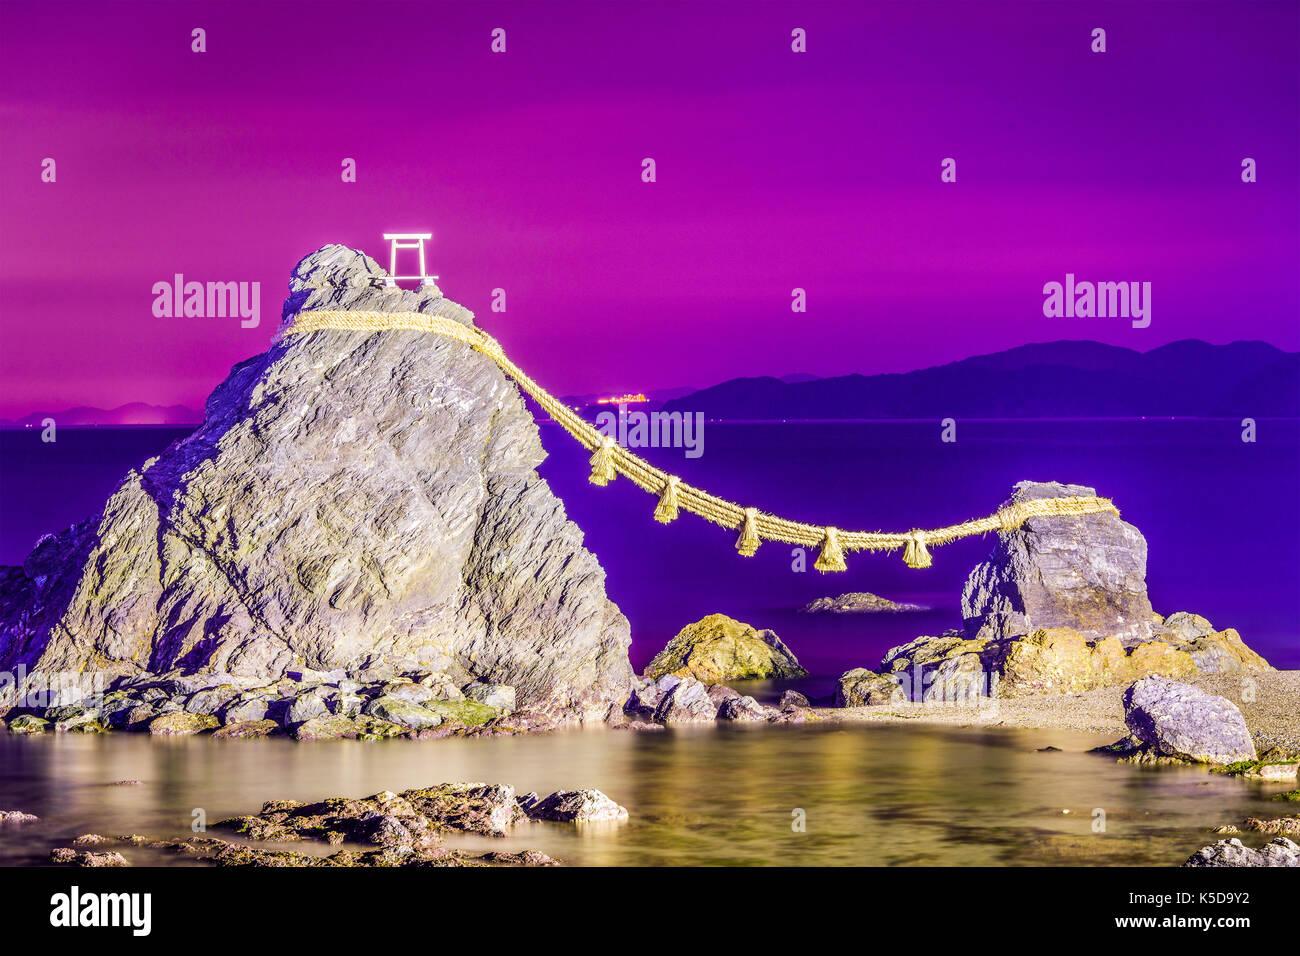 Meoto Iwa Rock of Ise, Japan. - Stock Image